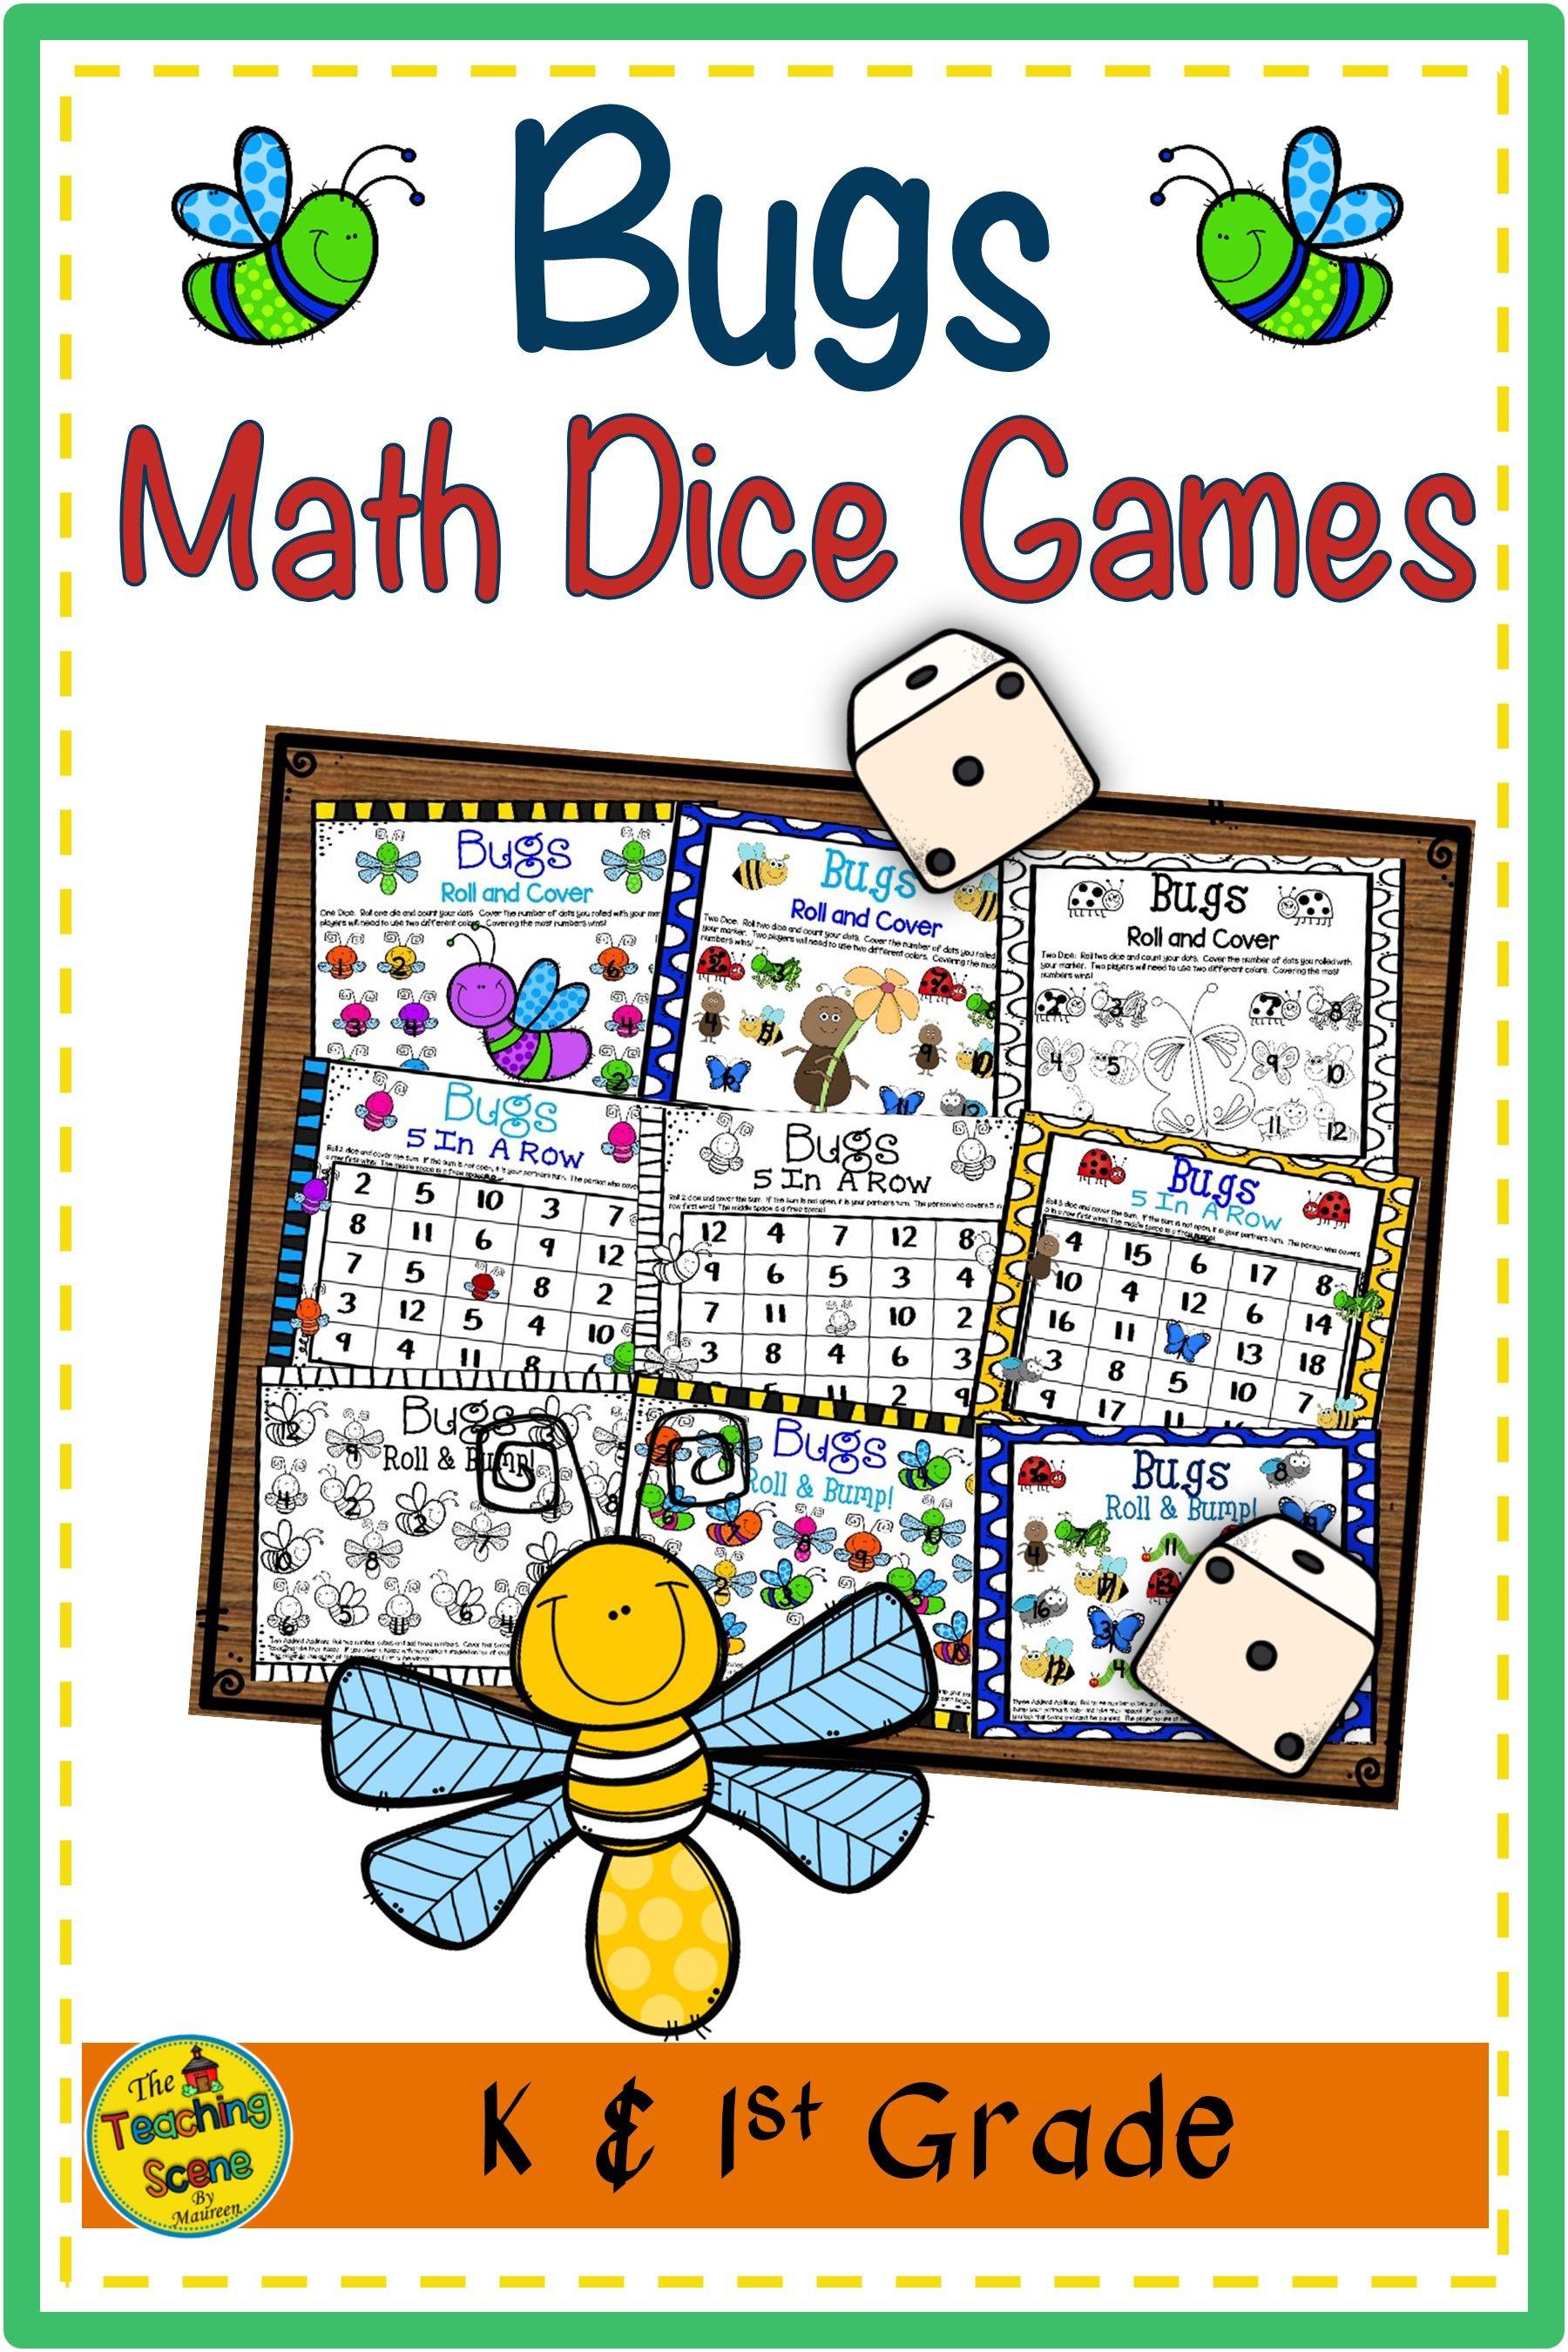 Bugs Math Dice Games in 2020 Math centers, Math facts, Math